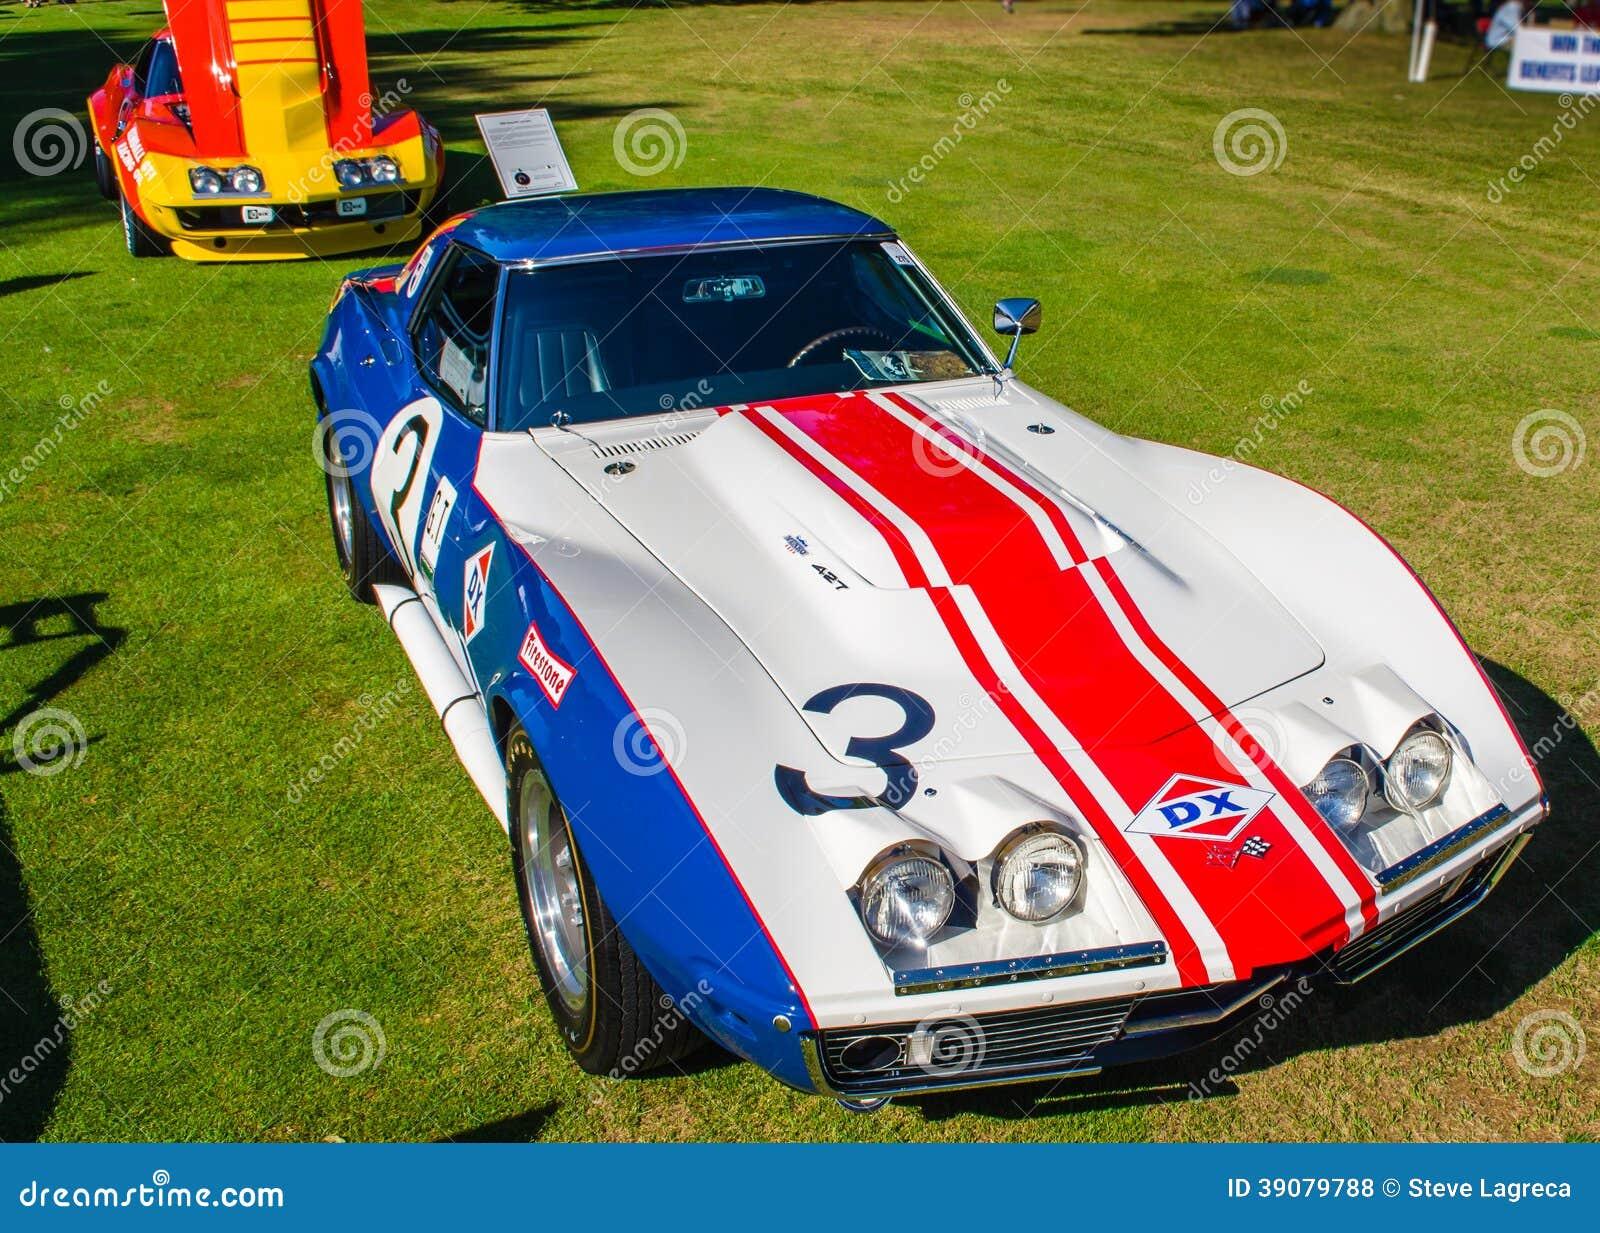 Corvette Flags Tattoo Www Imgkid Com The Image Kid Has It